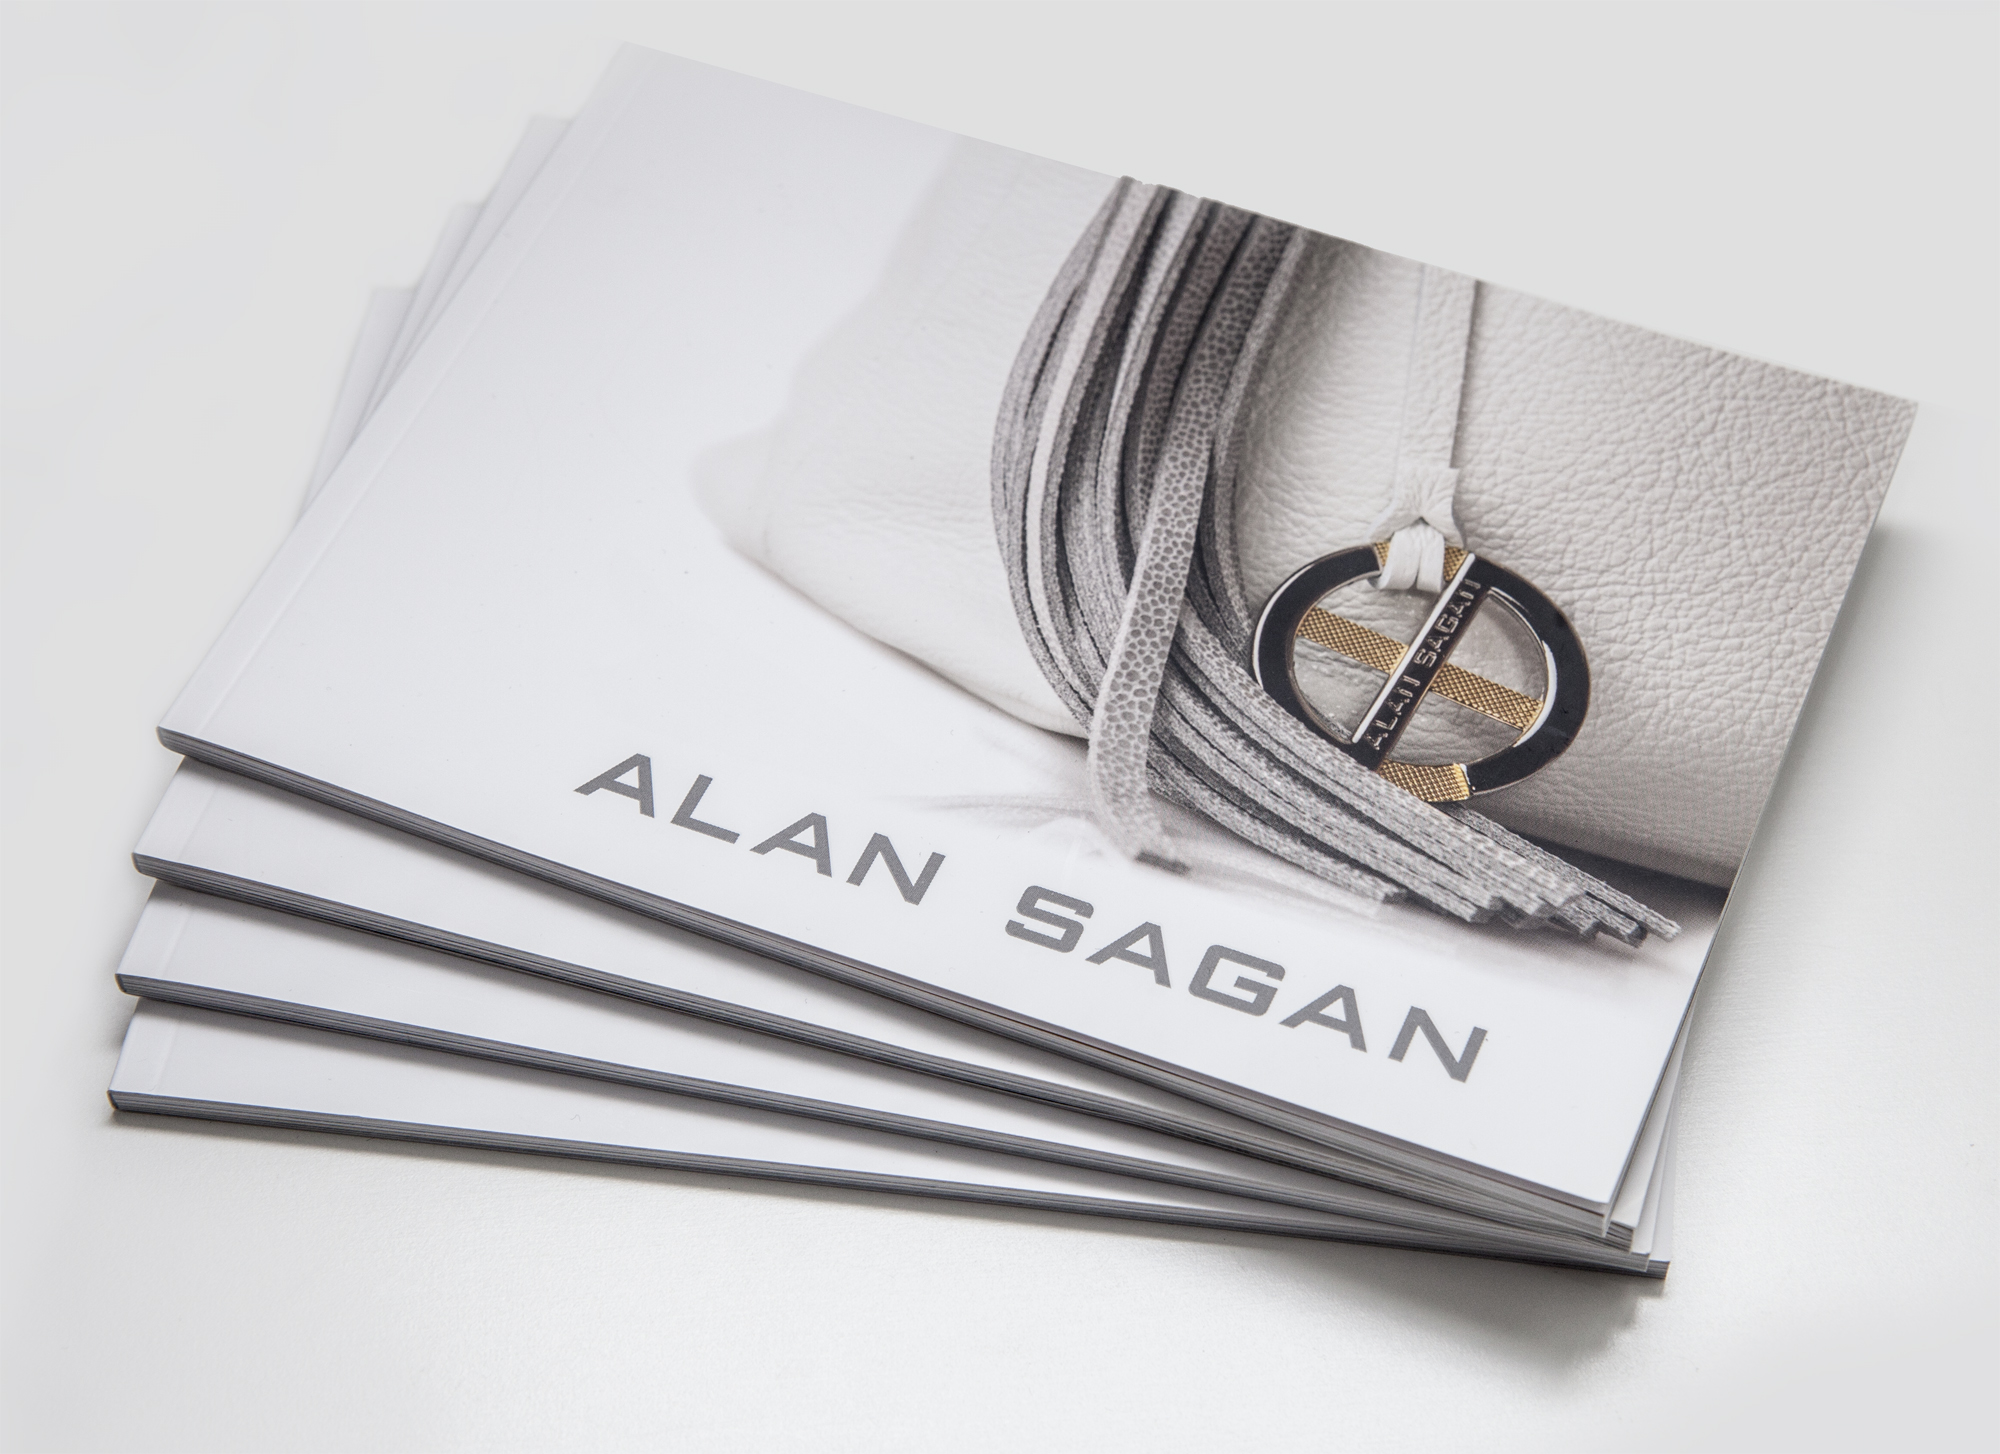 katalog-sagan-display-13